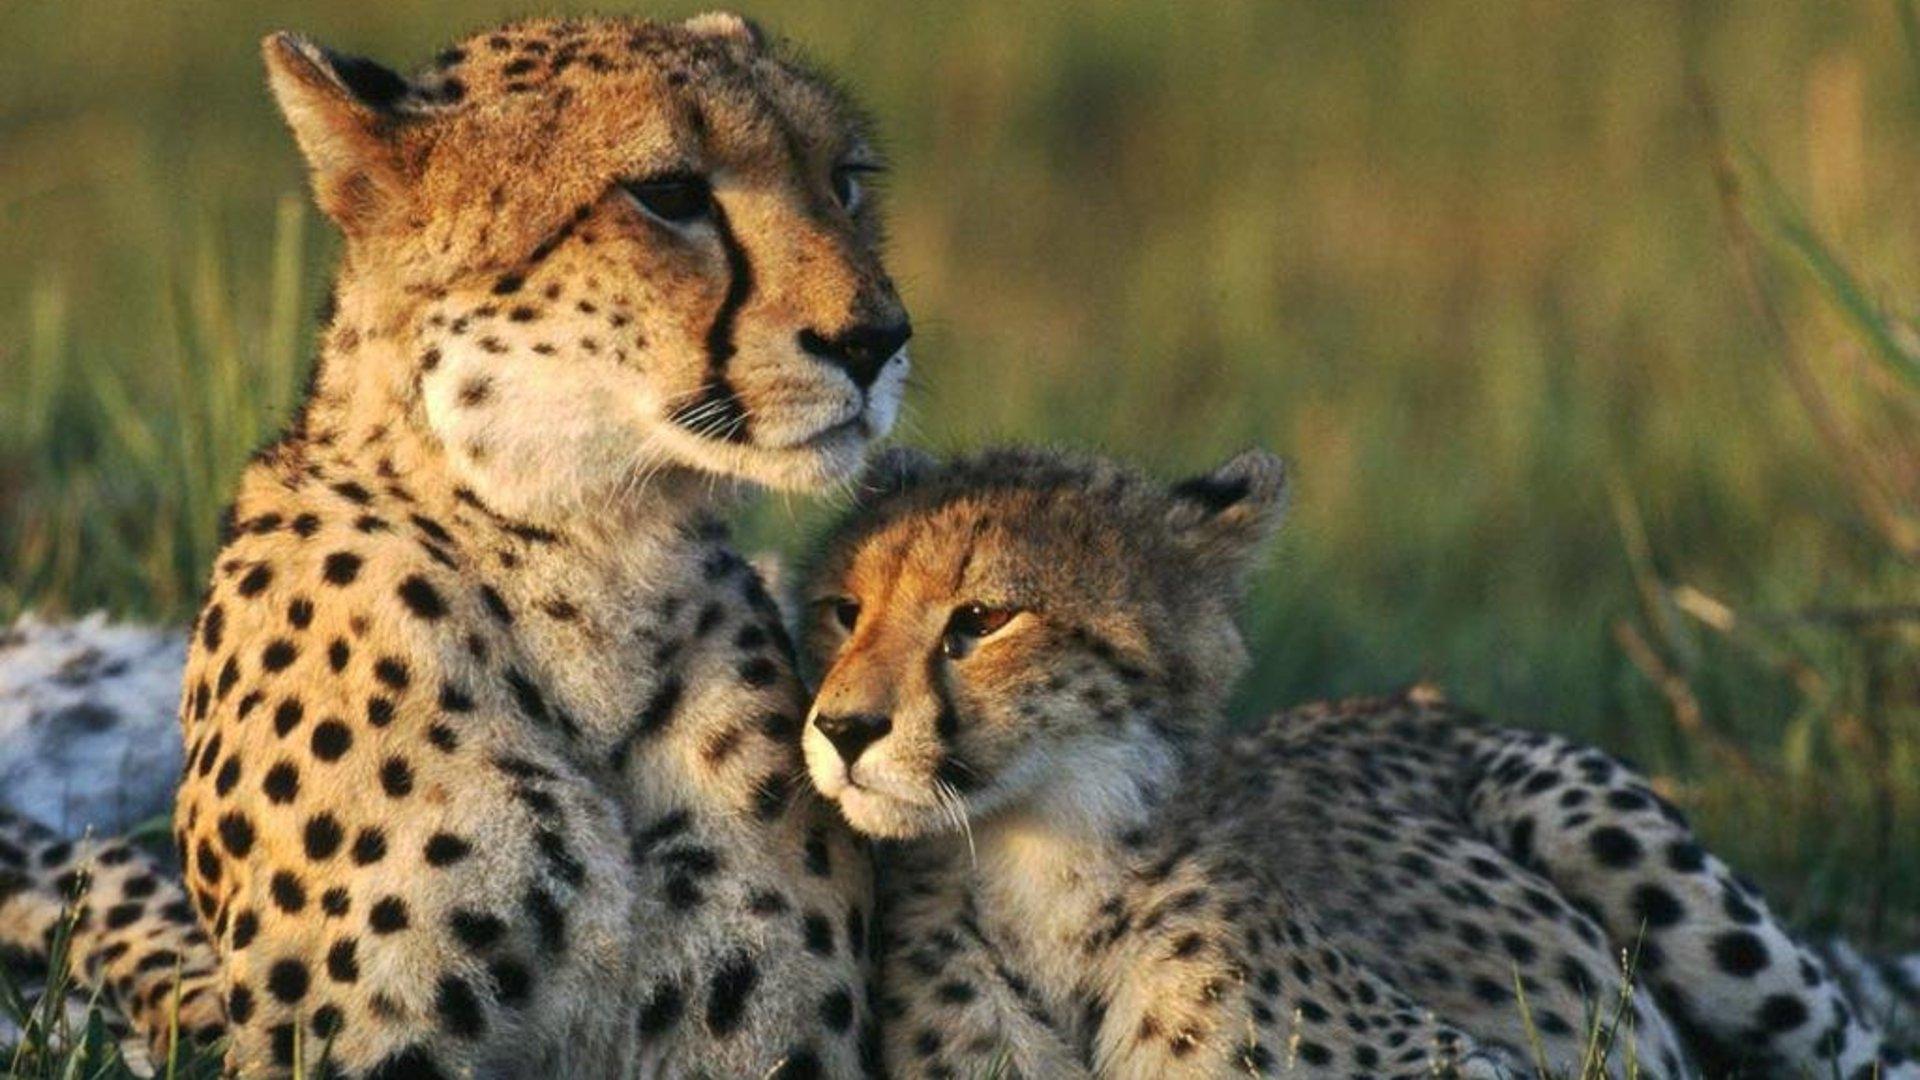 Cute Zootopia Wallpaper Phone Cheetah Wallpapers Hd Pixelstalk Net